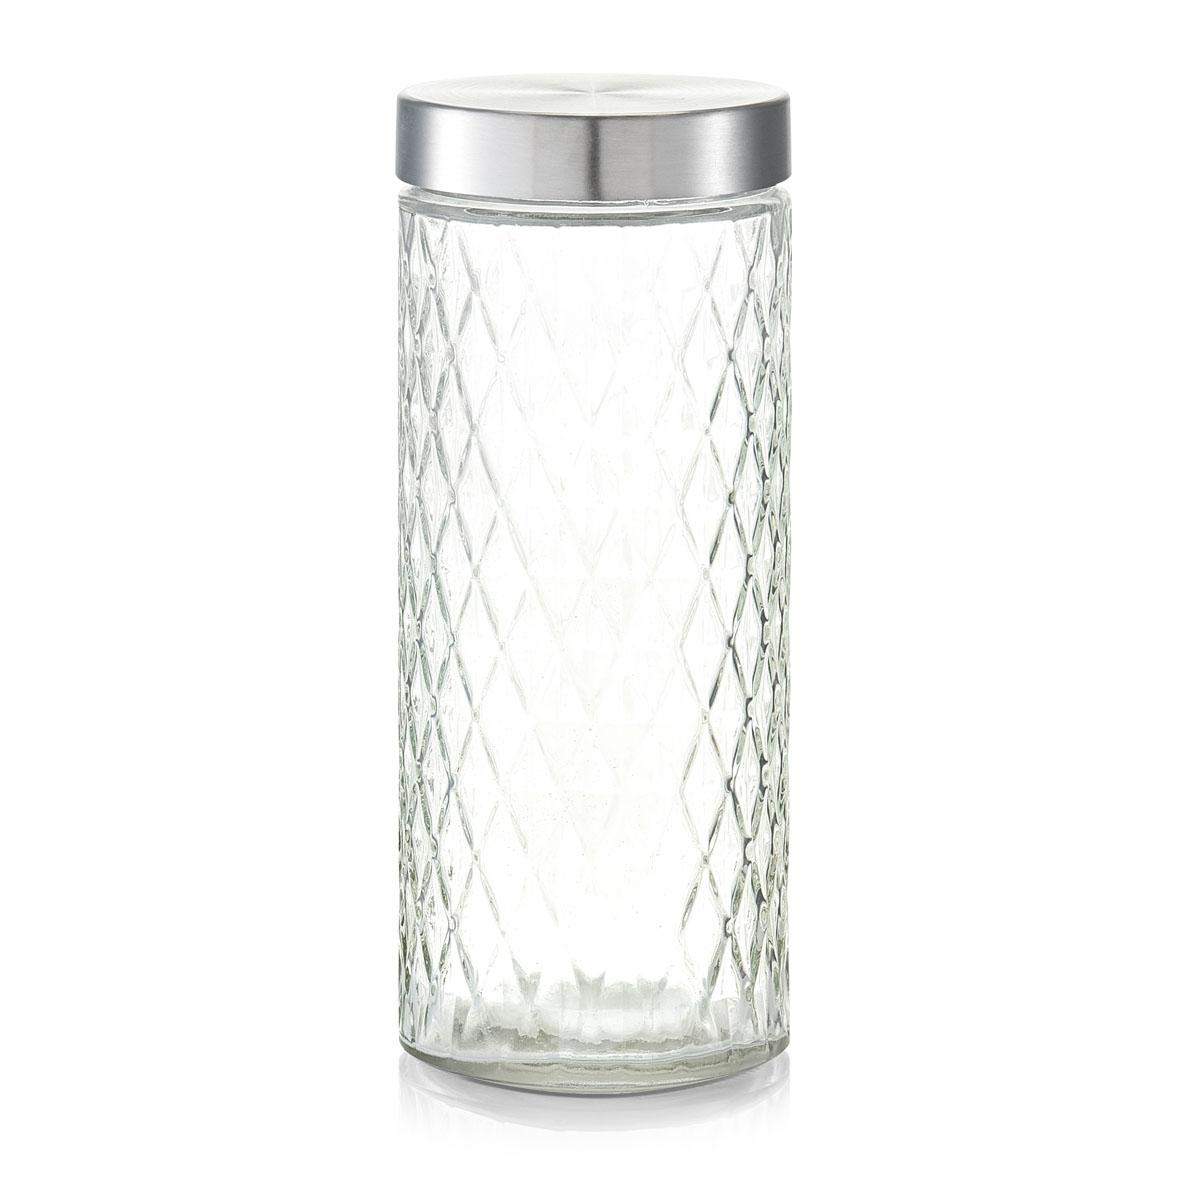 Recipient pentru depozitare cu capac metalic, Diamond III Glass, 2000 ml, Ø 11xH27,5 cm imagine